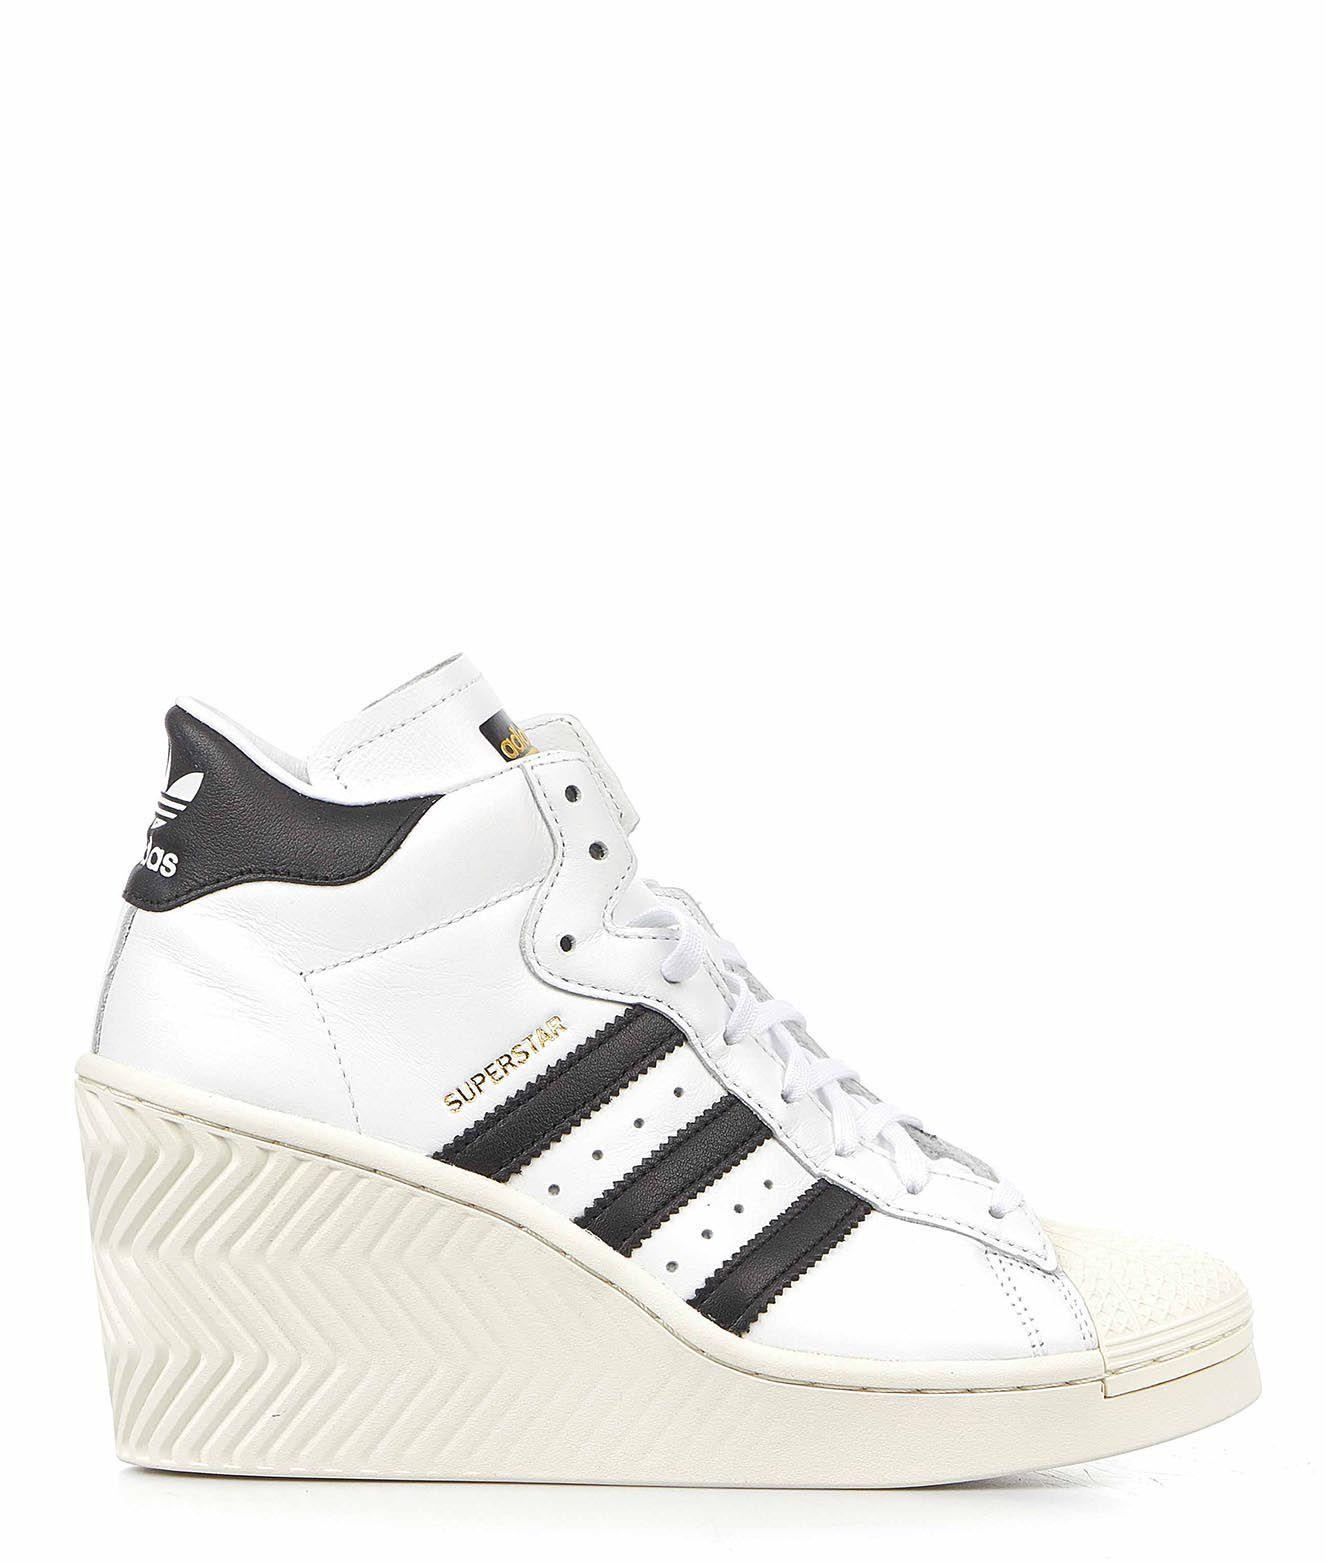 Adidas Originals ADIDAS WOMEN'S WHITE SNEAKERS